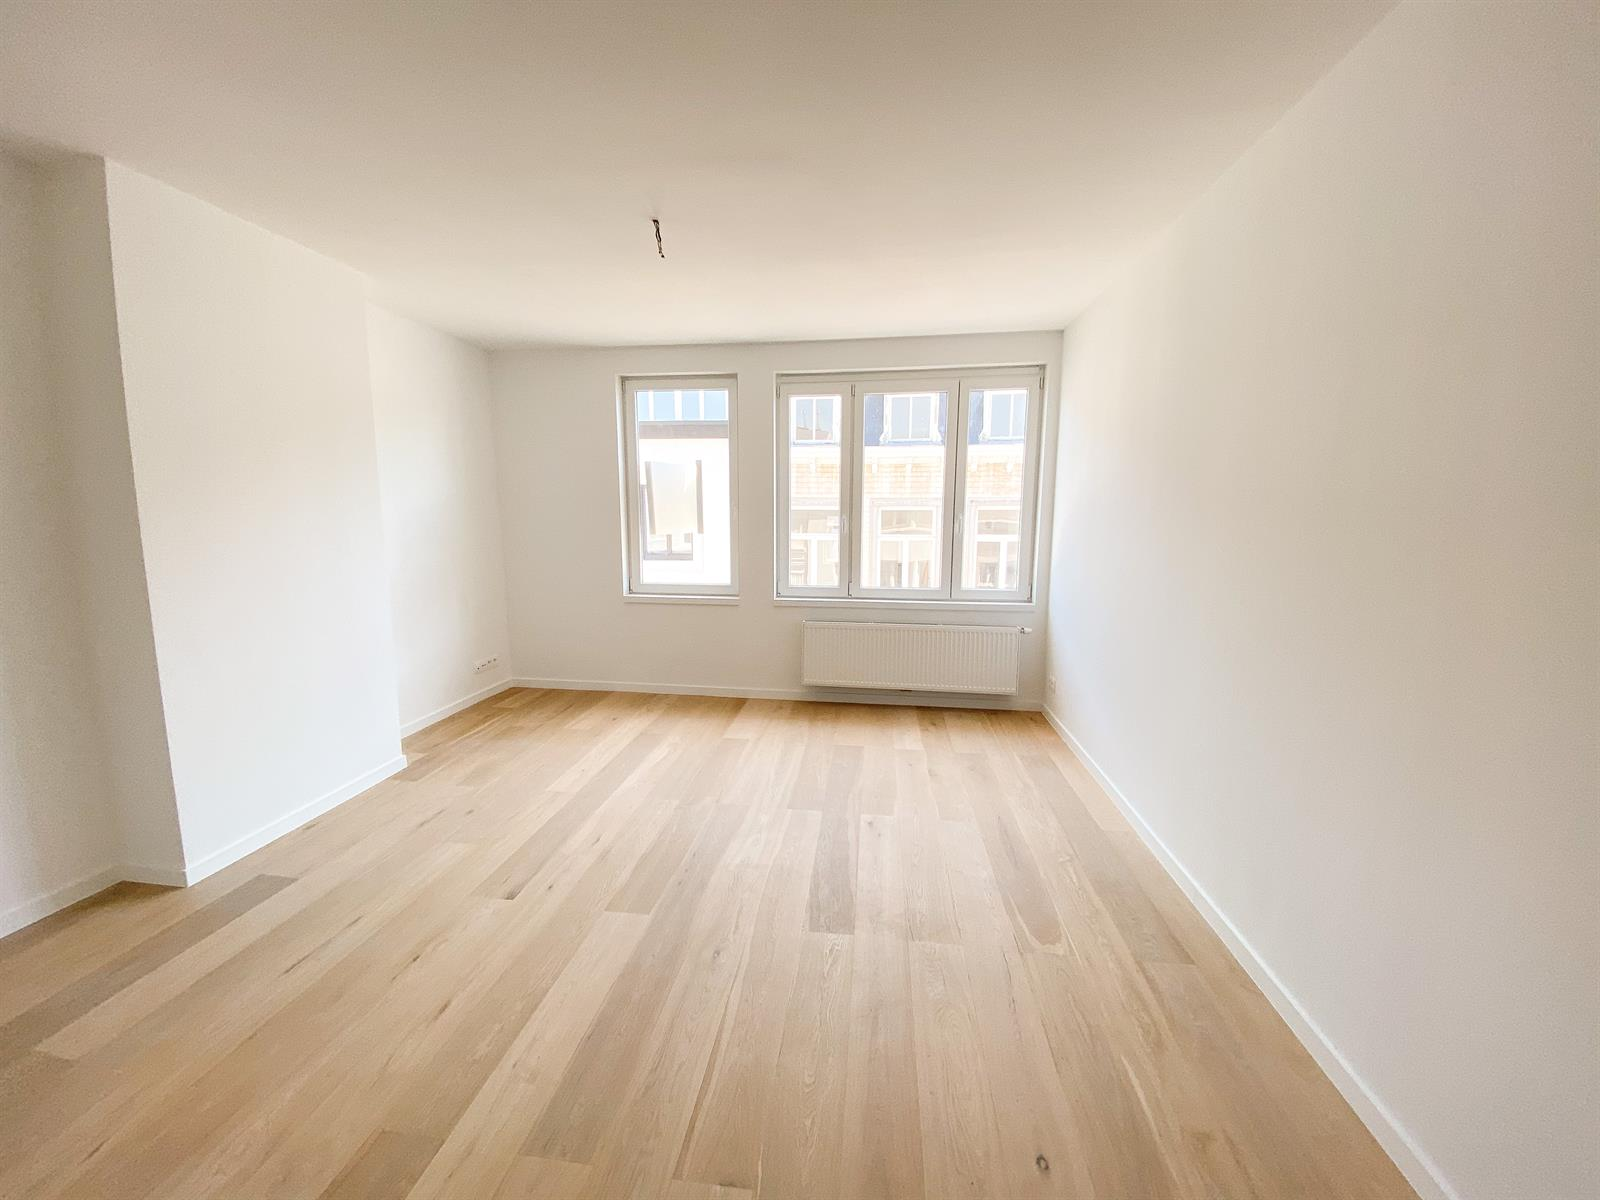 Appartement - Liège - #4045826-2